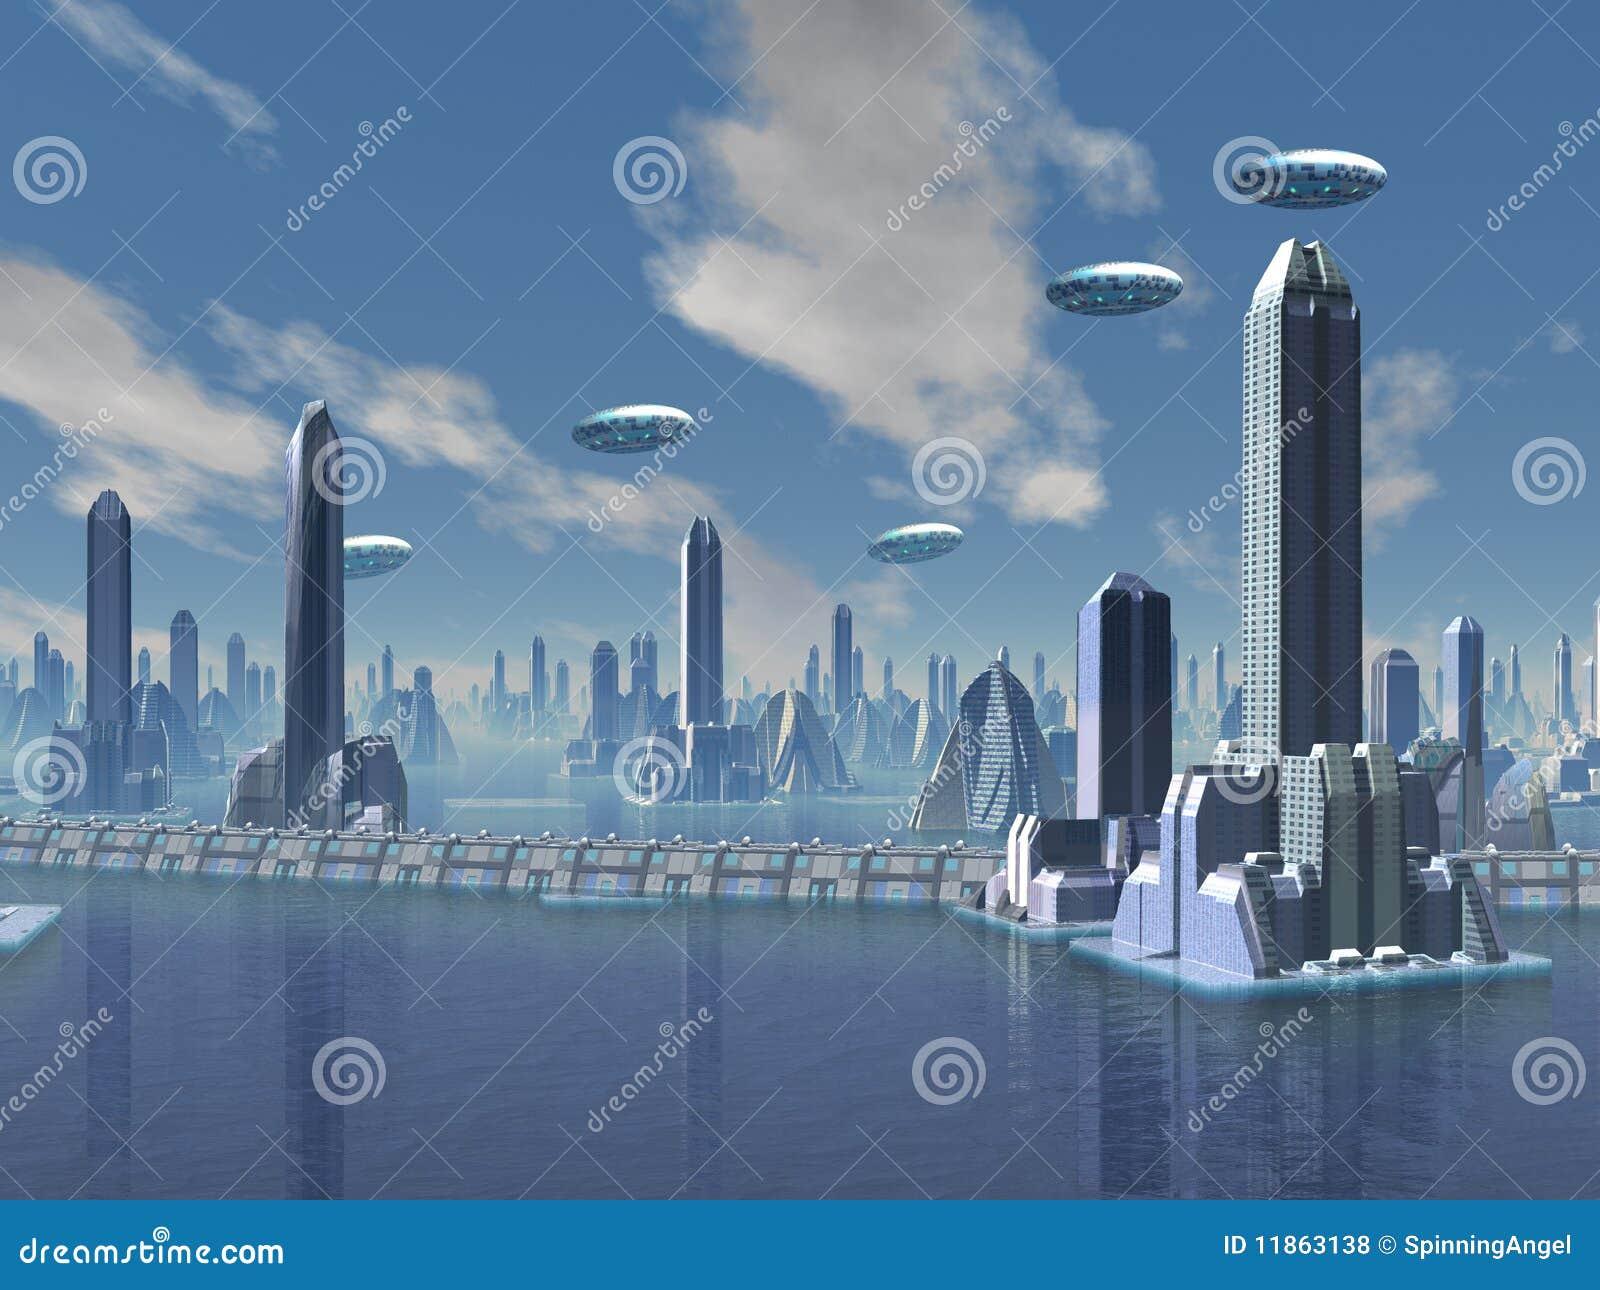 UFO over Futuristische Vreemde Stad